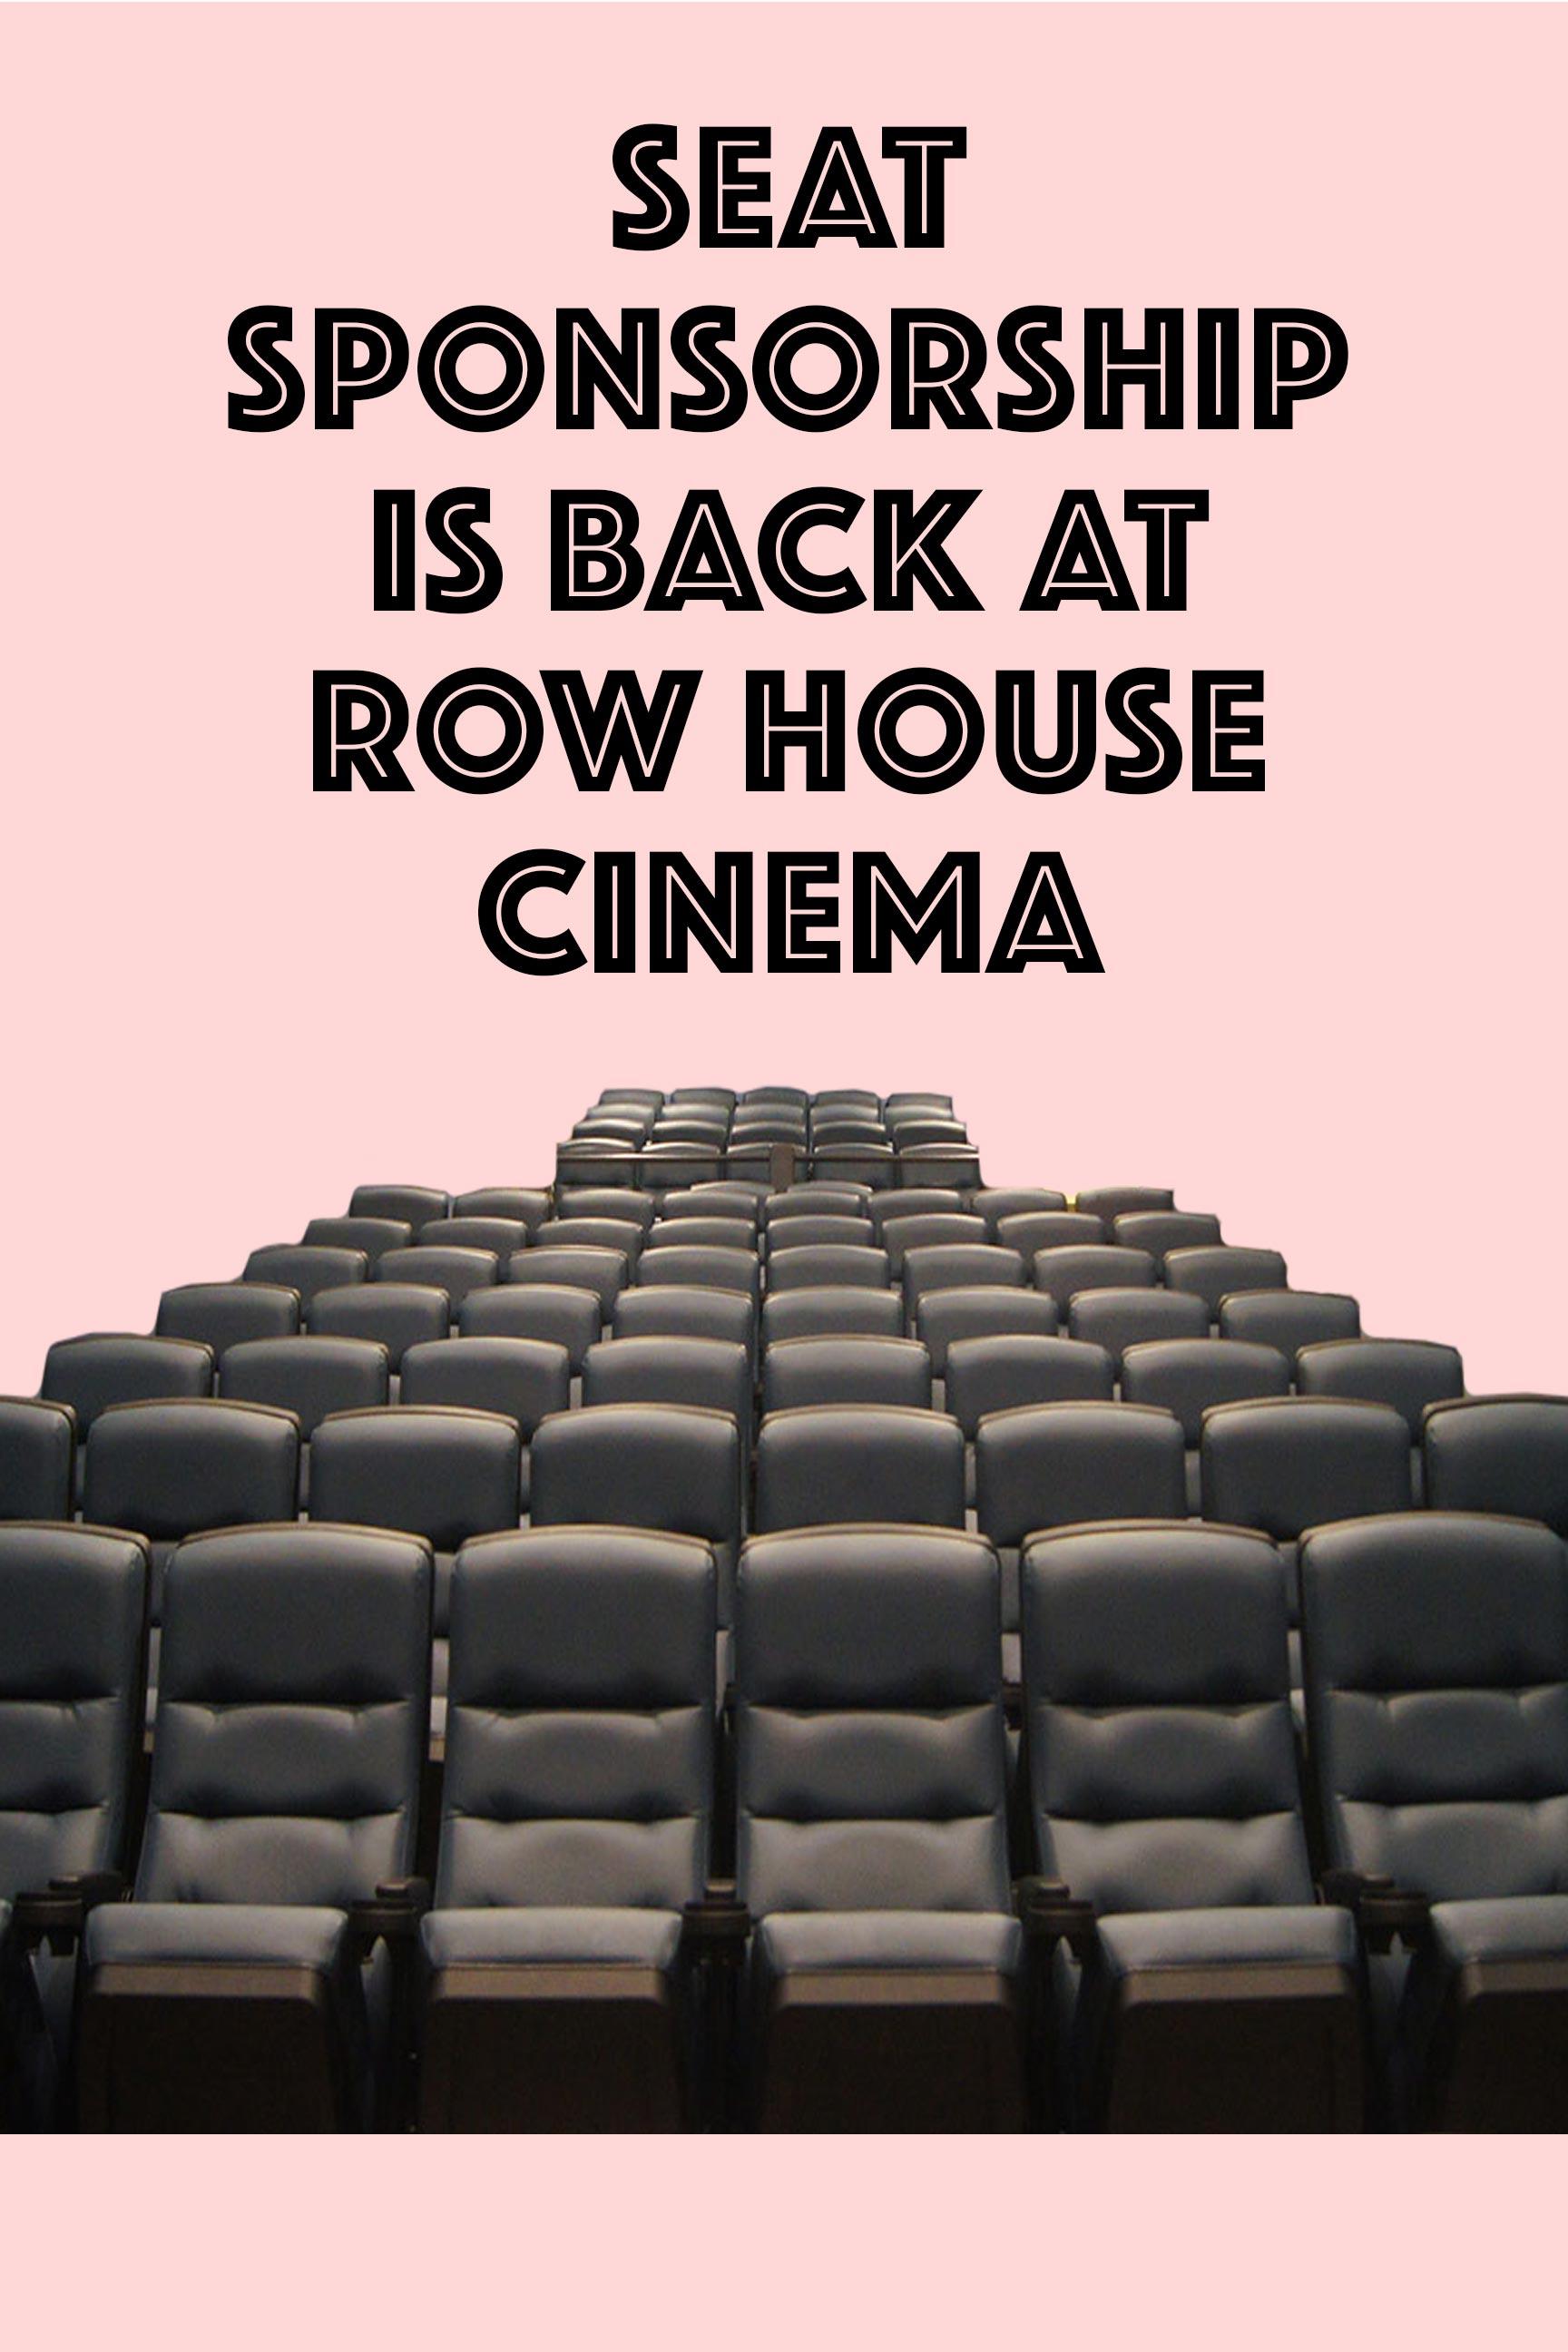 Poster for Sponsor A Seat (Sponsor Seat)